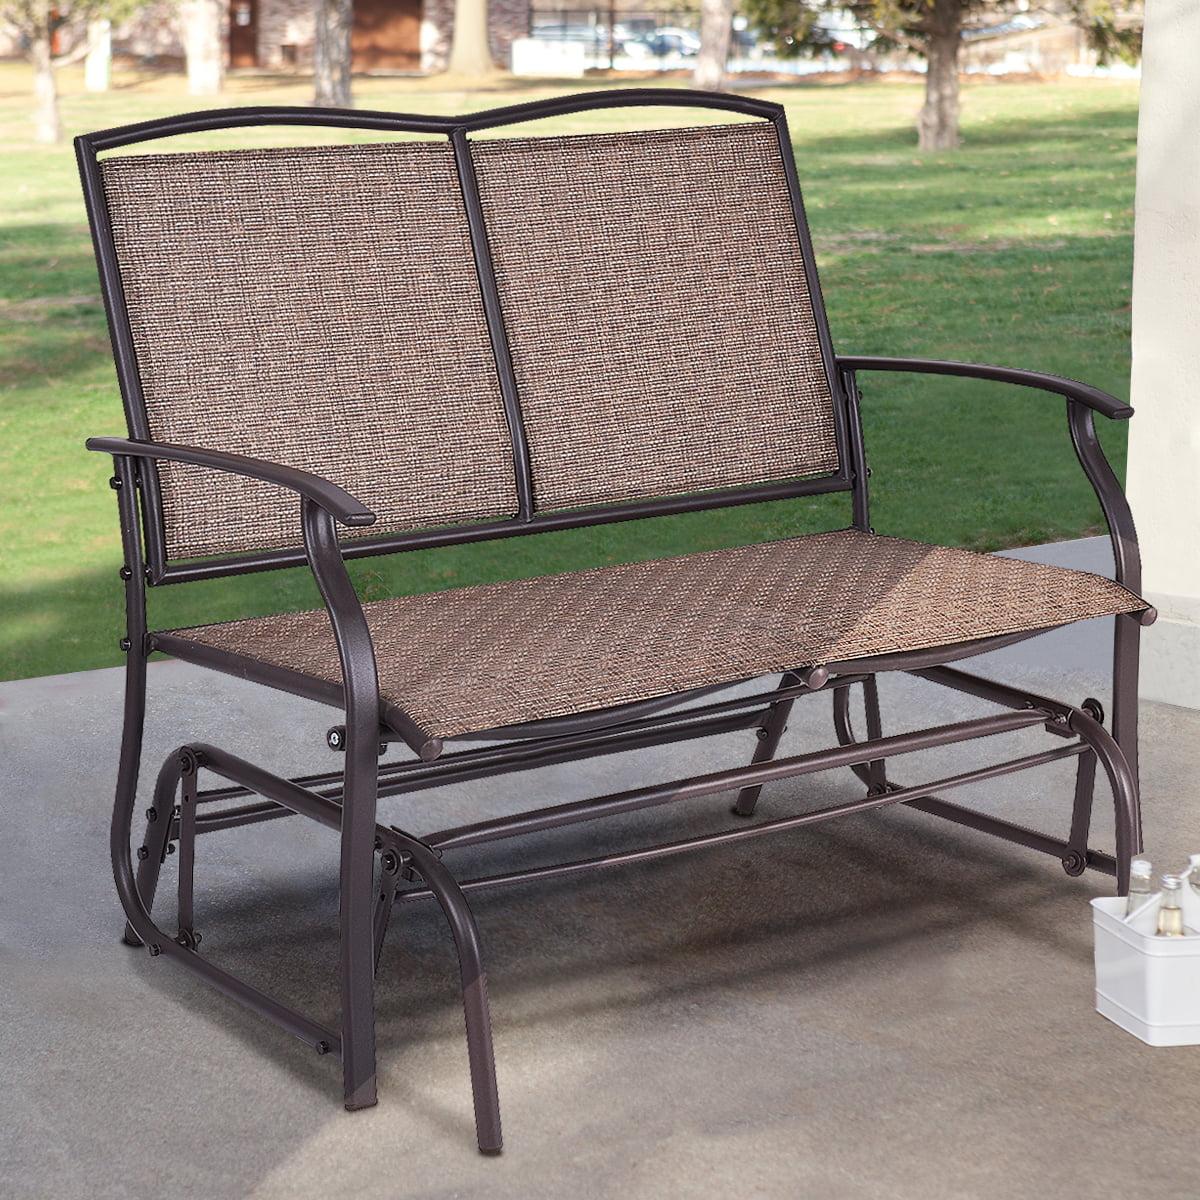 costway patio glider rocking bench double 2 person chair loveseat armchair backyard walmart com